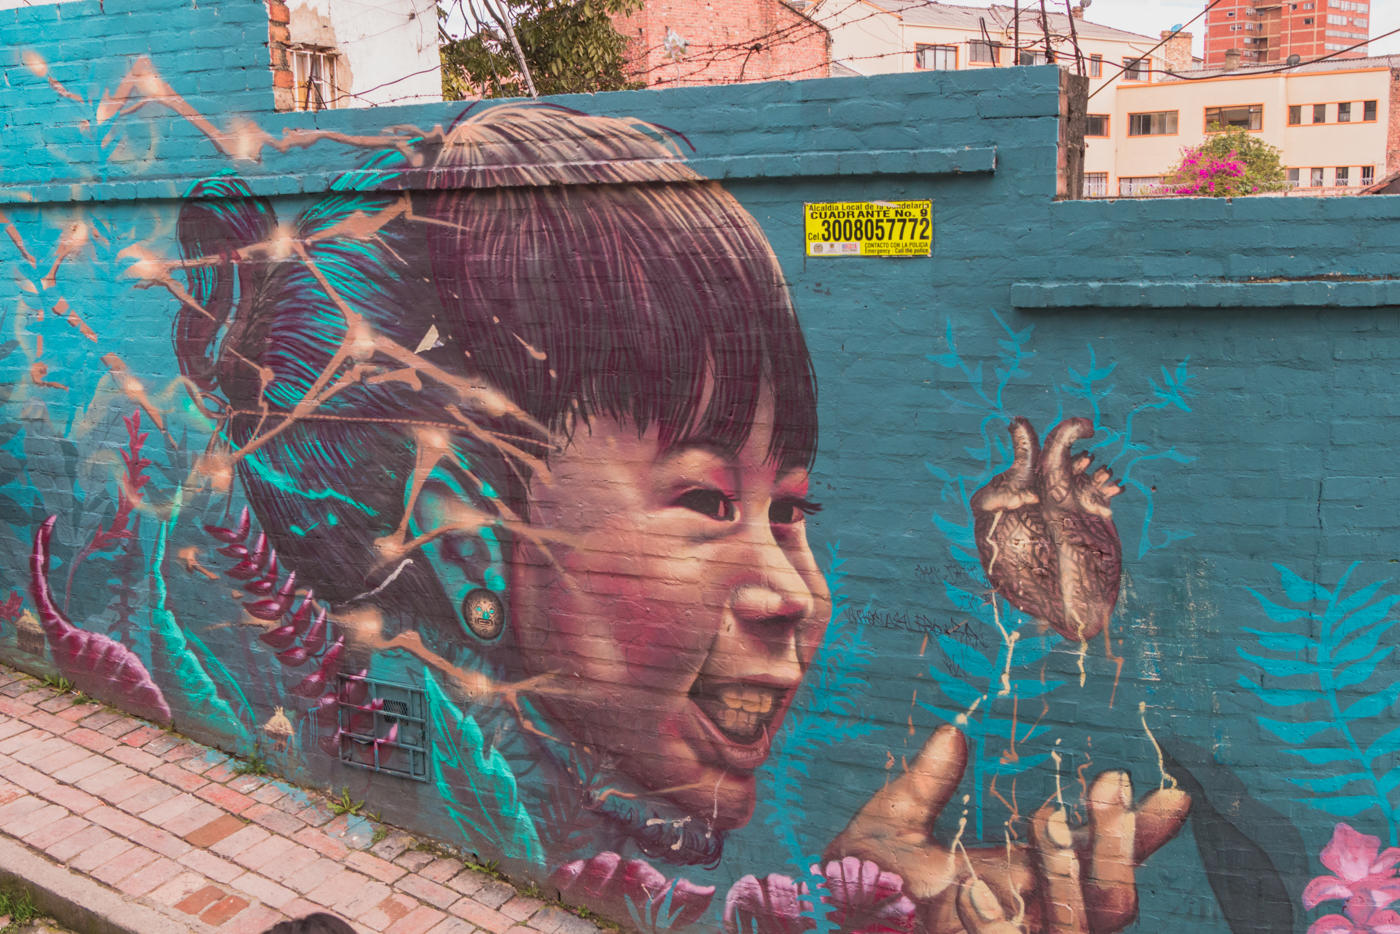 Streetart in der Altstadt Bogotá's - La Candelaria